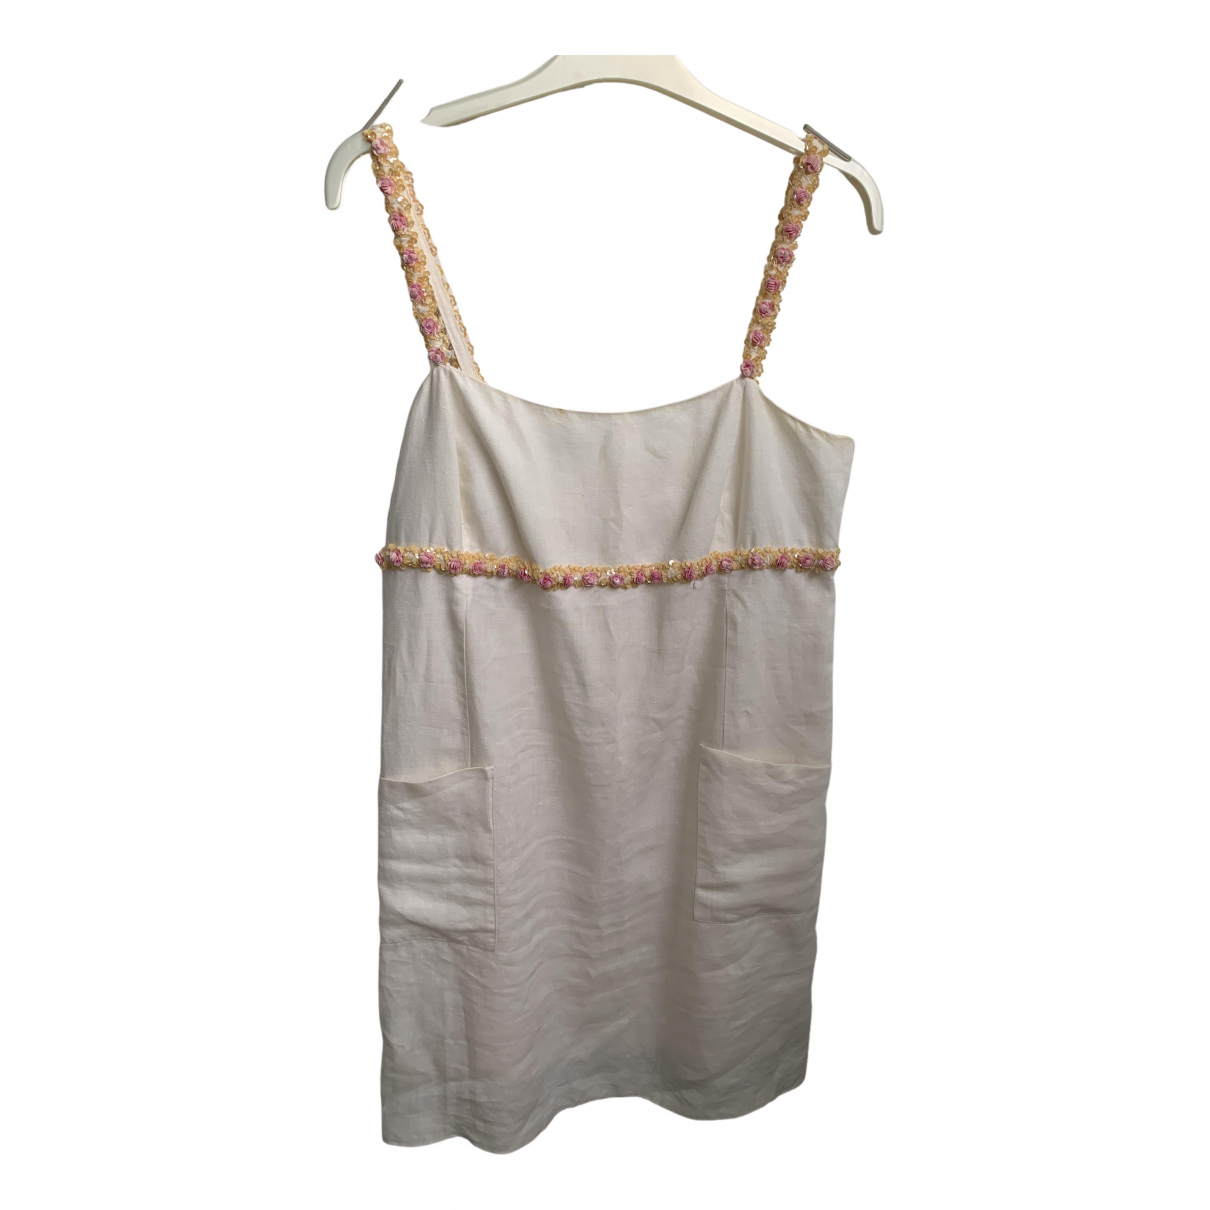 Chanel \N Kleid in  Beige Leinen